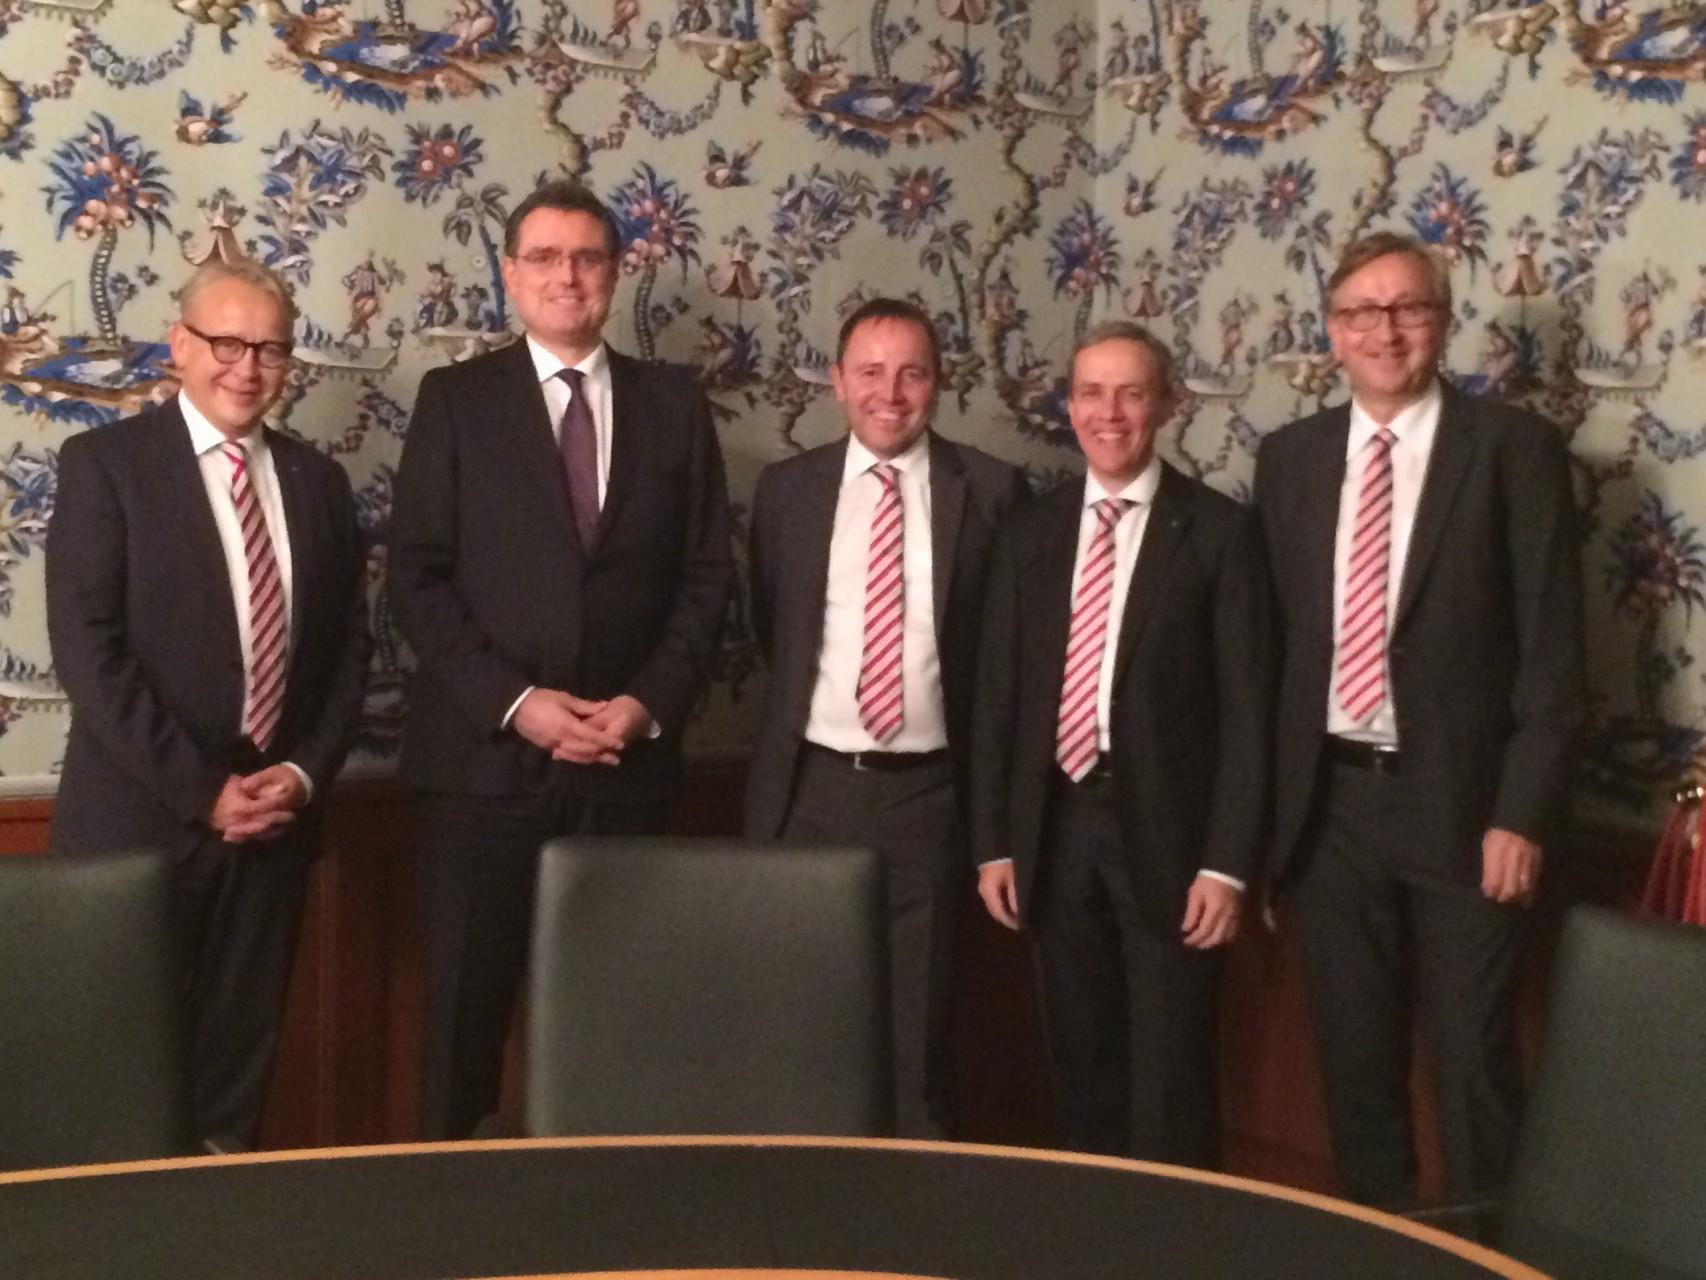 Stadtrat Uster am 30. Okt. 2015 zu Besuch beim Direktorium der SNB im Schloss Gerzensee